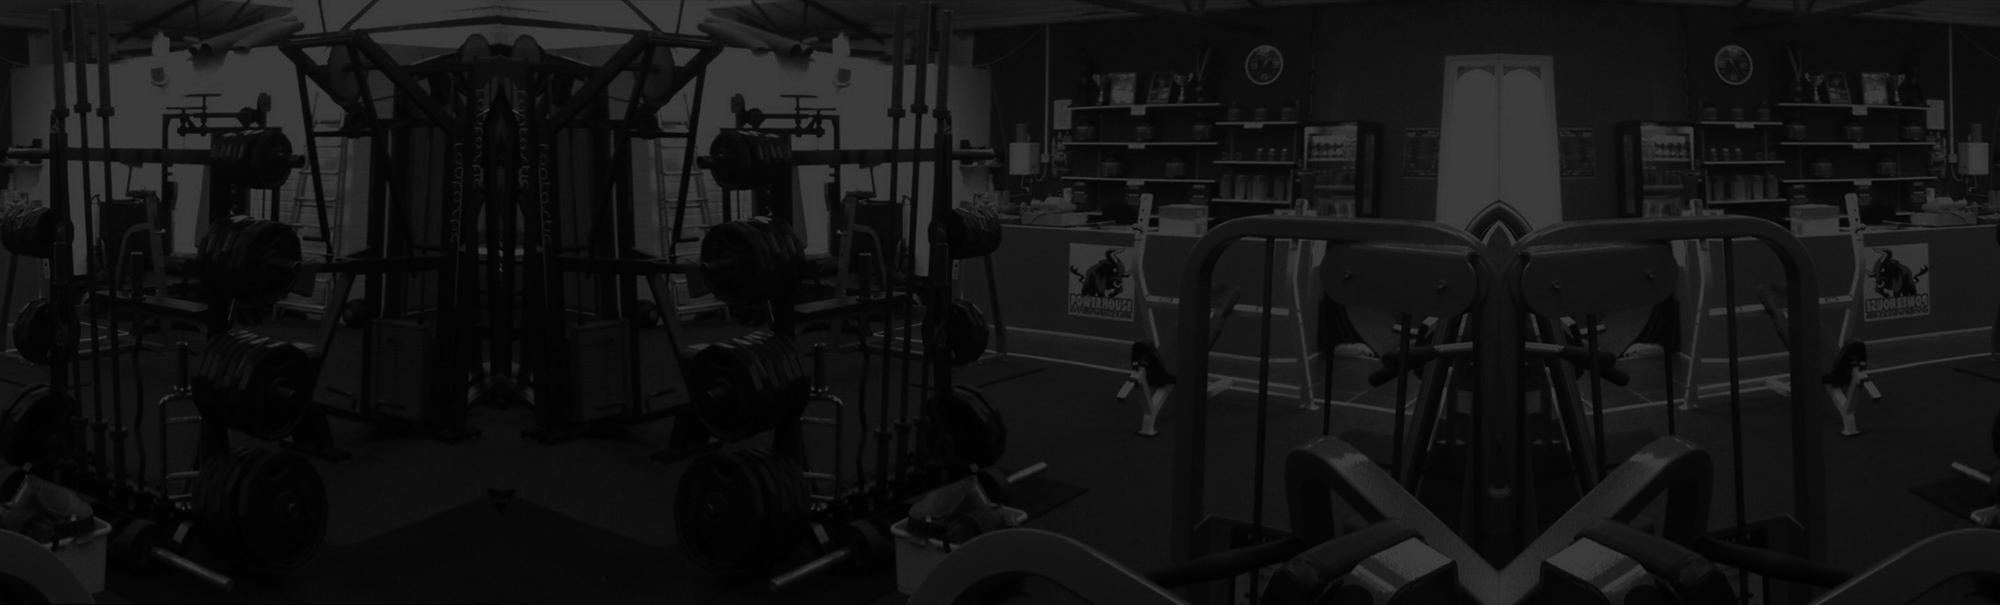 Fitness Aletleri Seçimini Neler Belirler?